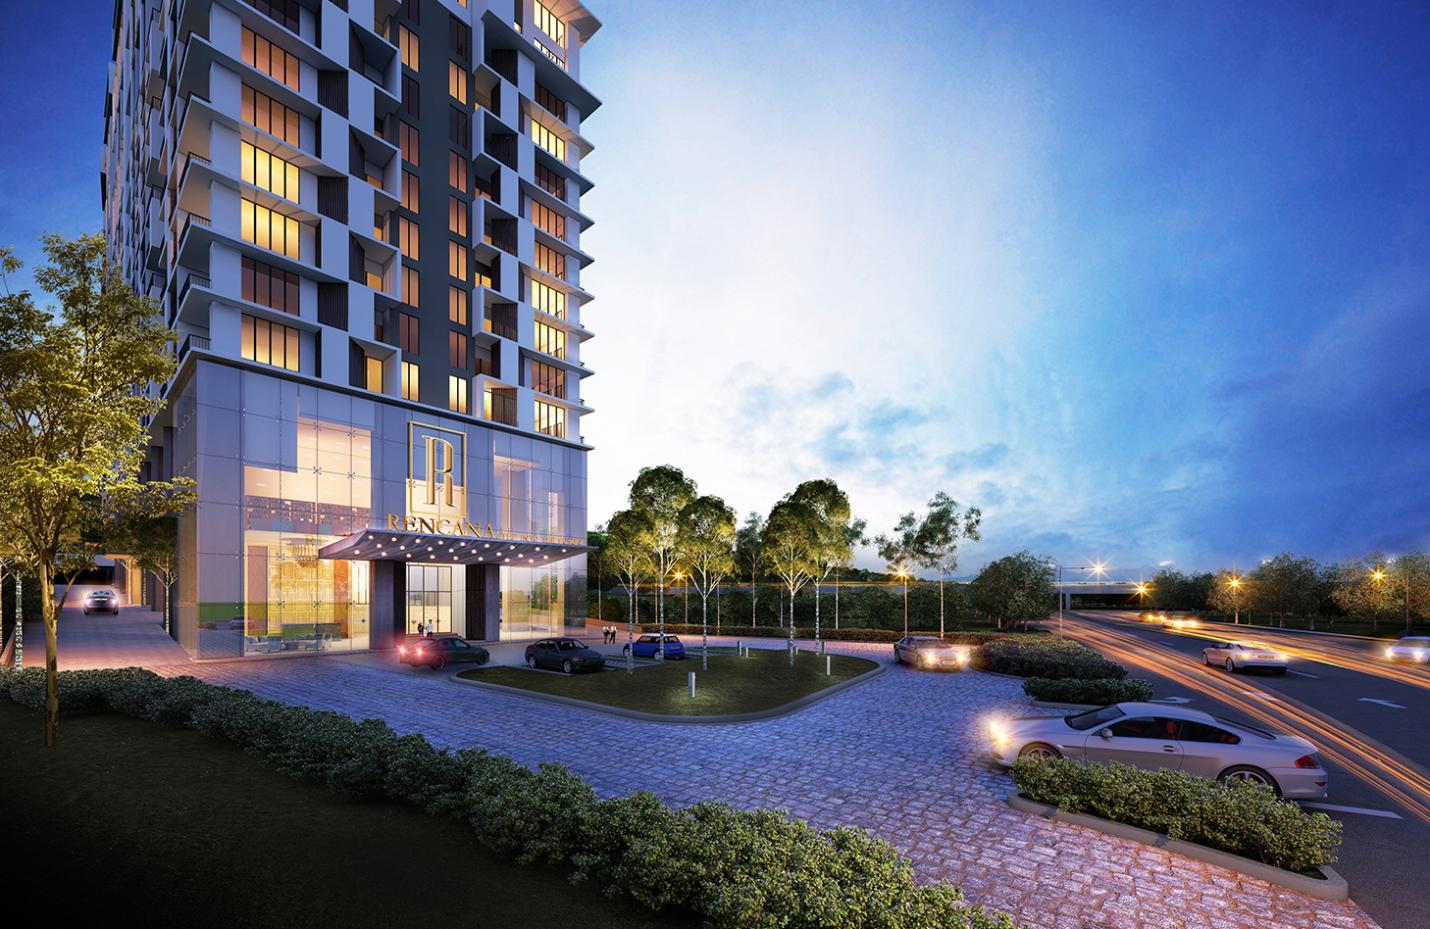 Rencana royale property kuala lumpur house for sale 1